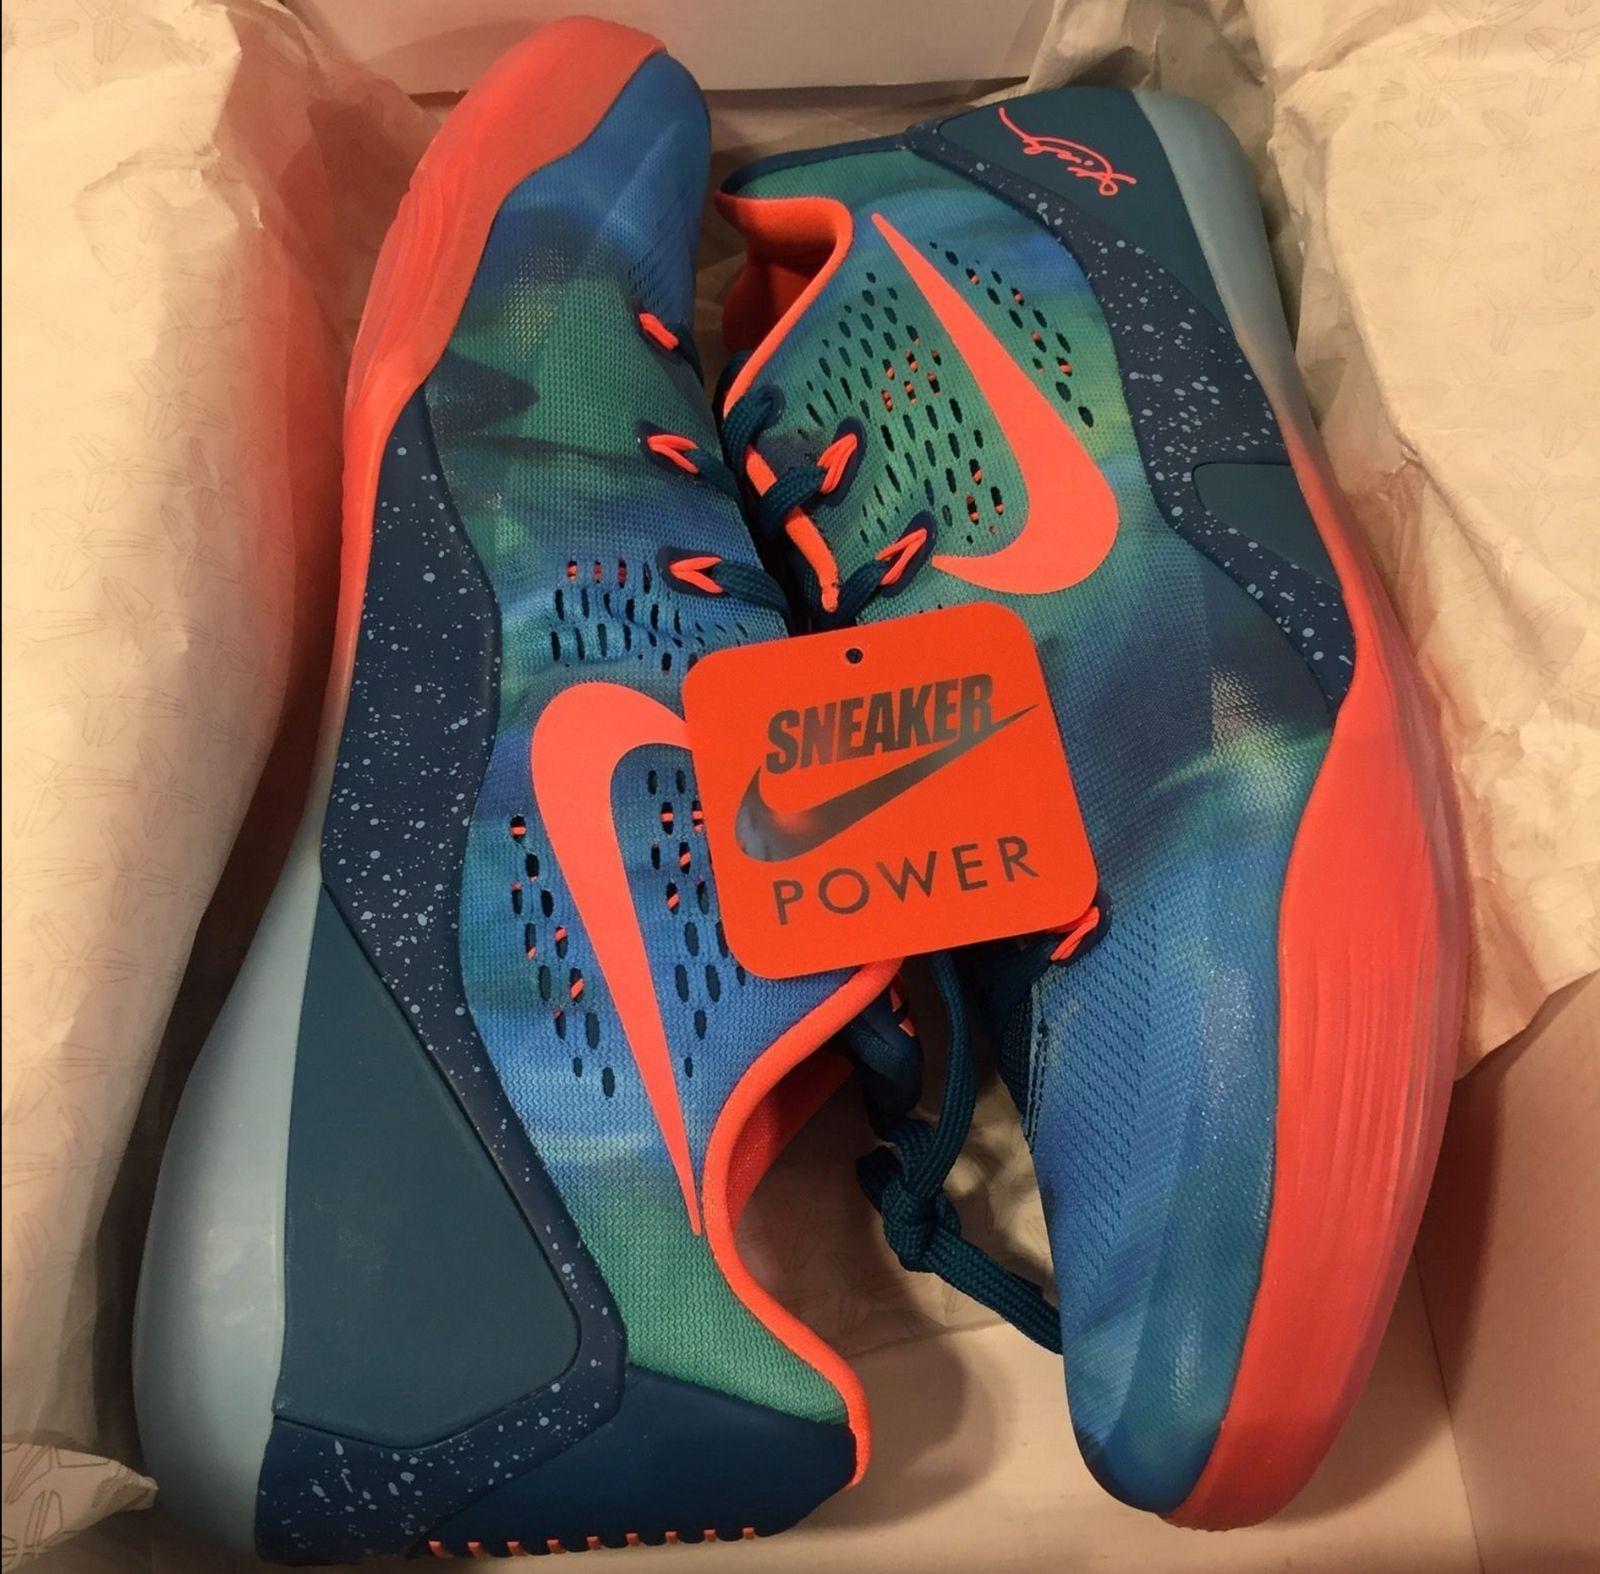 NEW DS Nike Zoom Kobe IX 9 EM Low Peach Jam Promo sz 11 11.5 13 Multicolor iv v